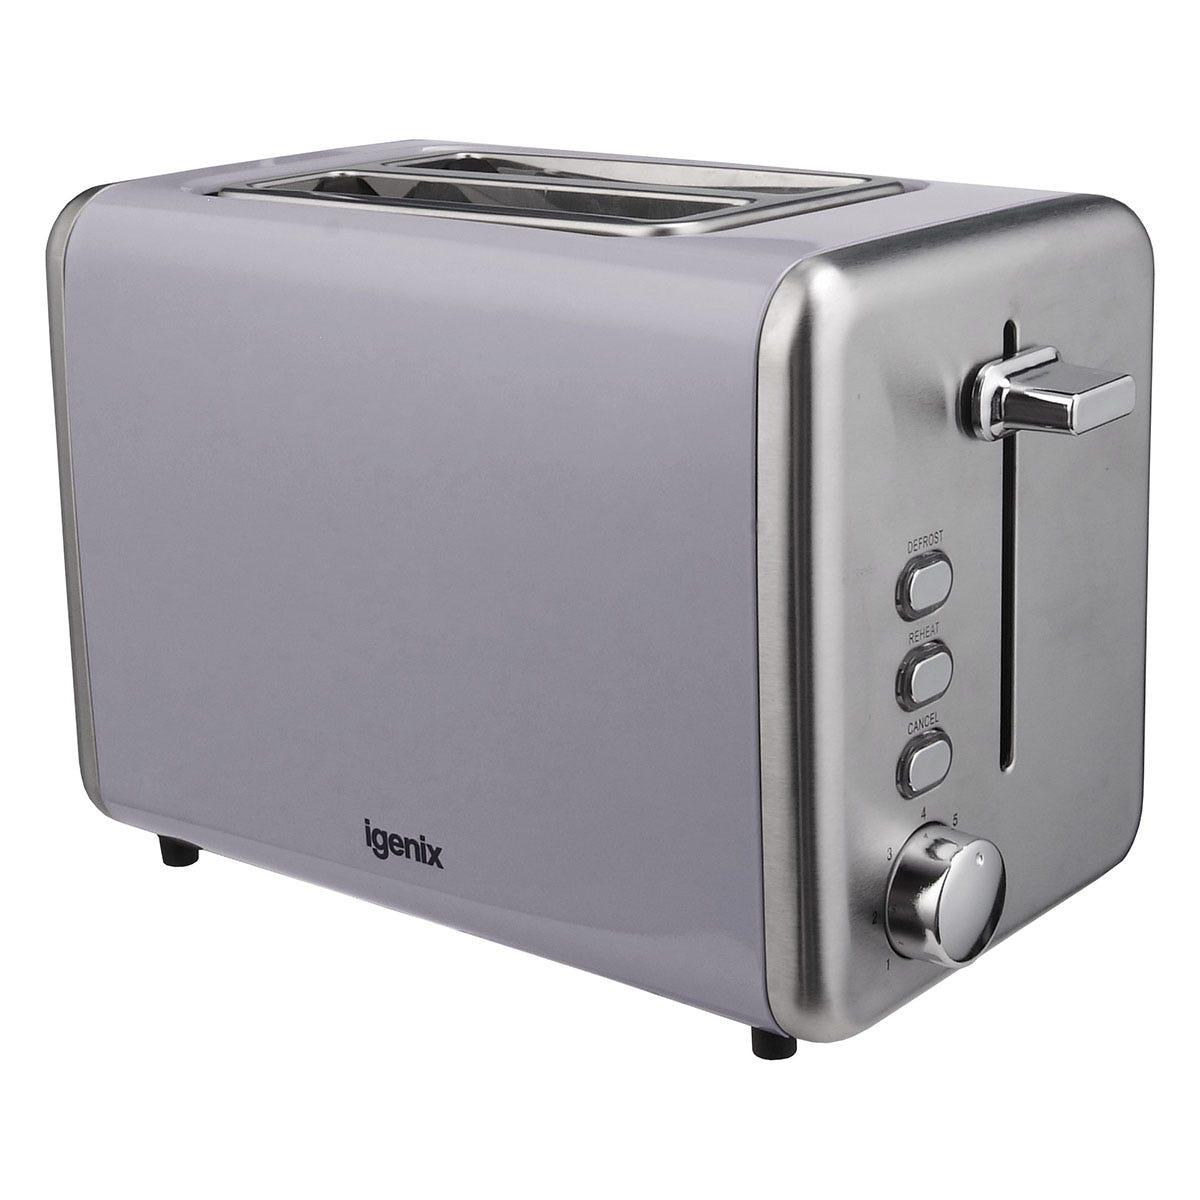 Igenix IG3000G 2-Slice Deep Slot 850W Stainless Steel Toaster - Grey